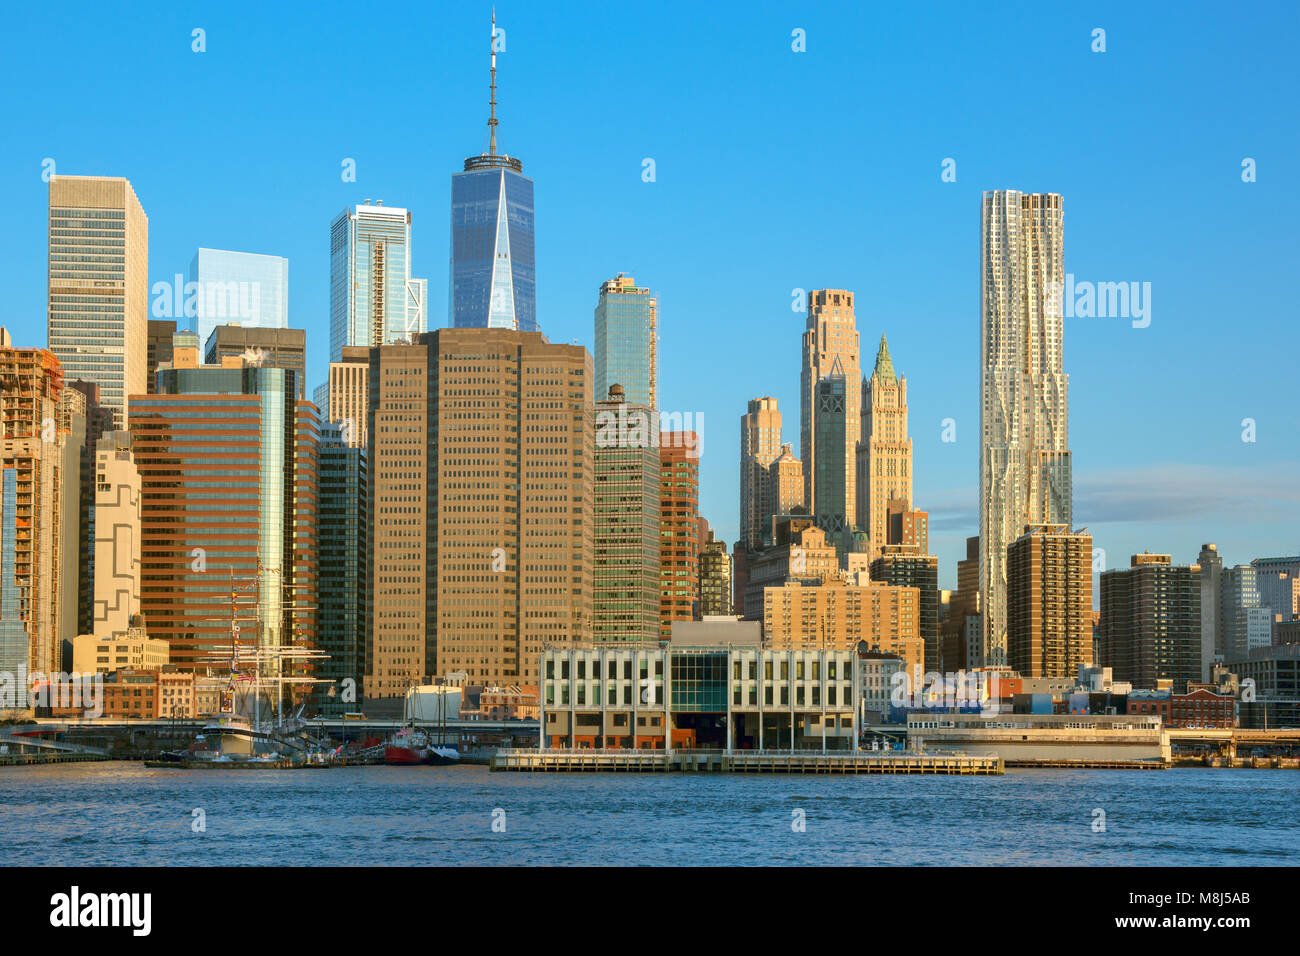 DOWNTOWN SKYLINE EAST RIVER MANHATTAN NEW YORK CITY USA Stock Photo